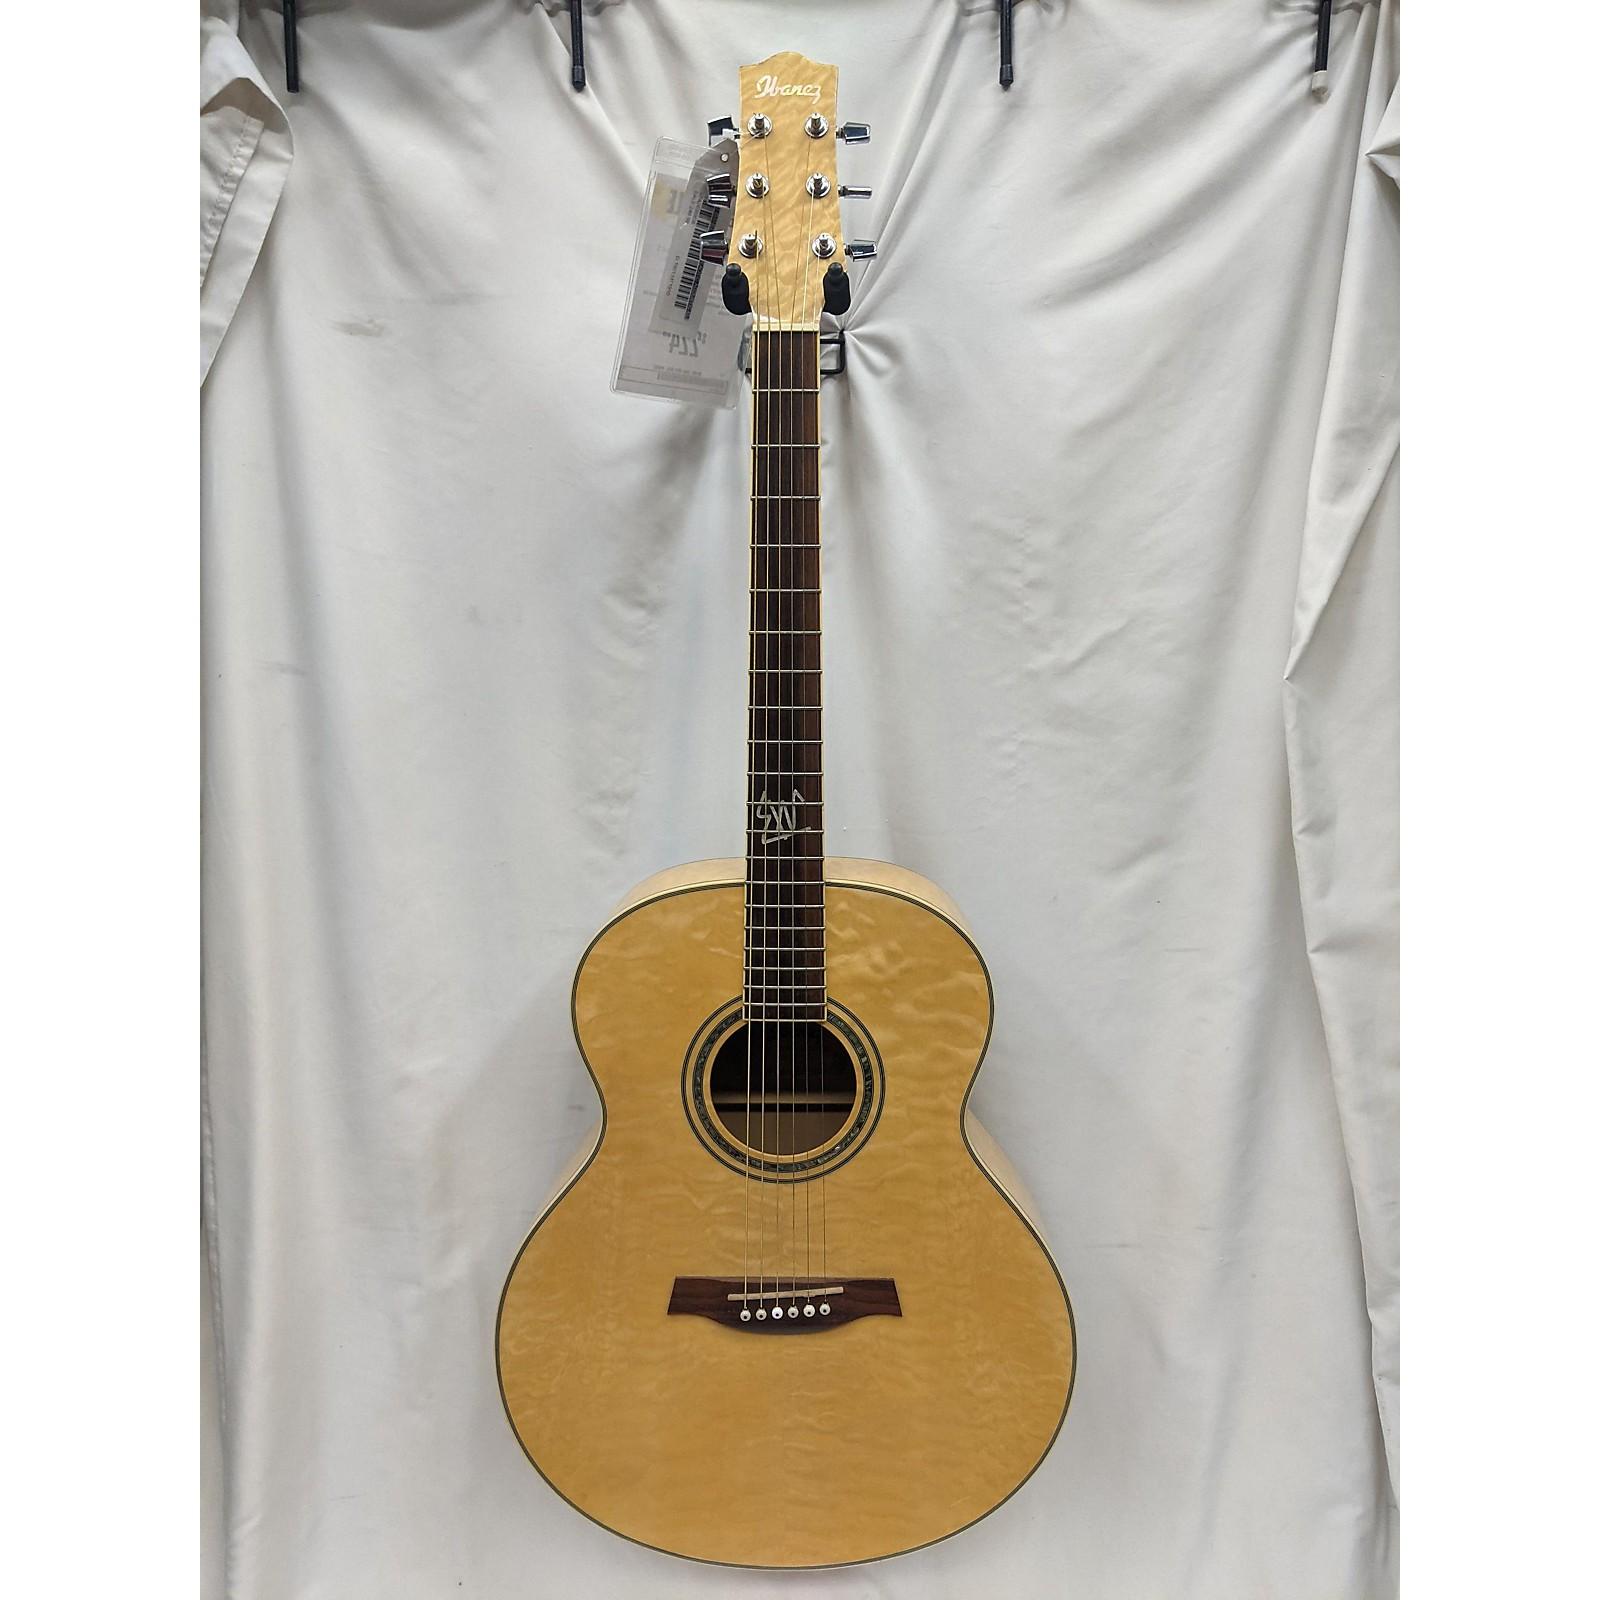 Ibanez EW20QMB Acoustic Electric Guitar